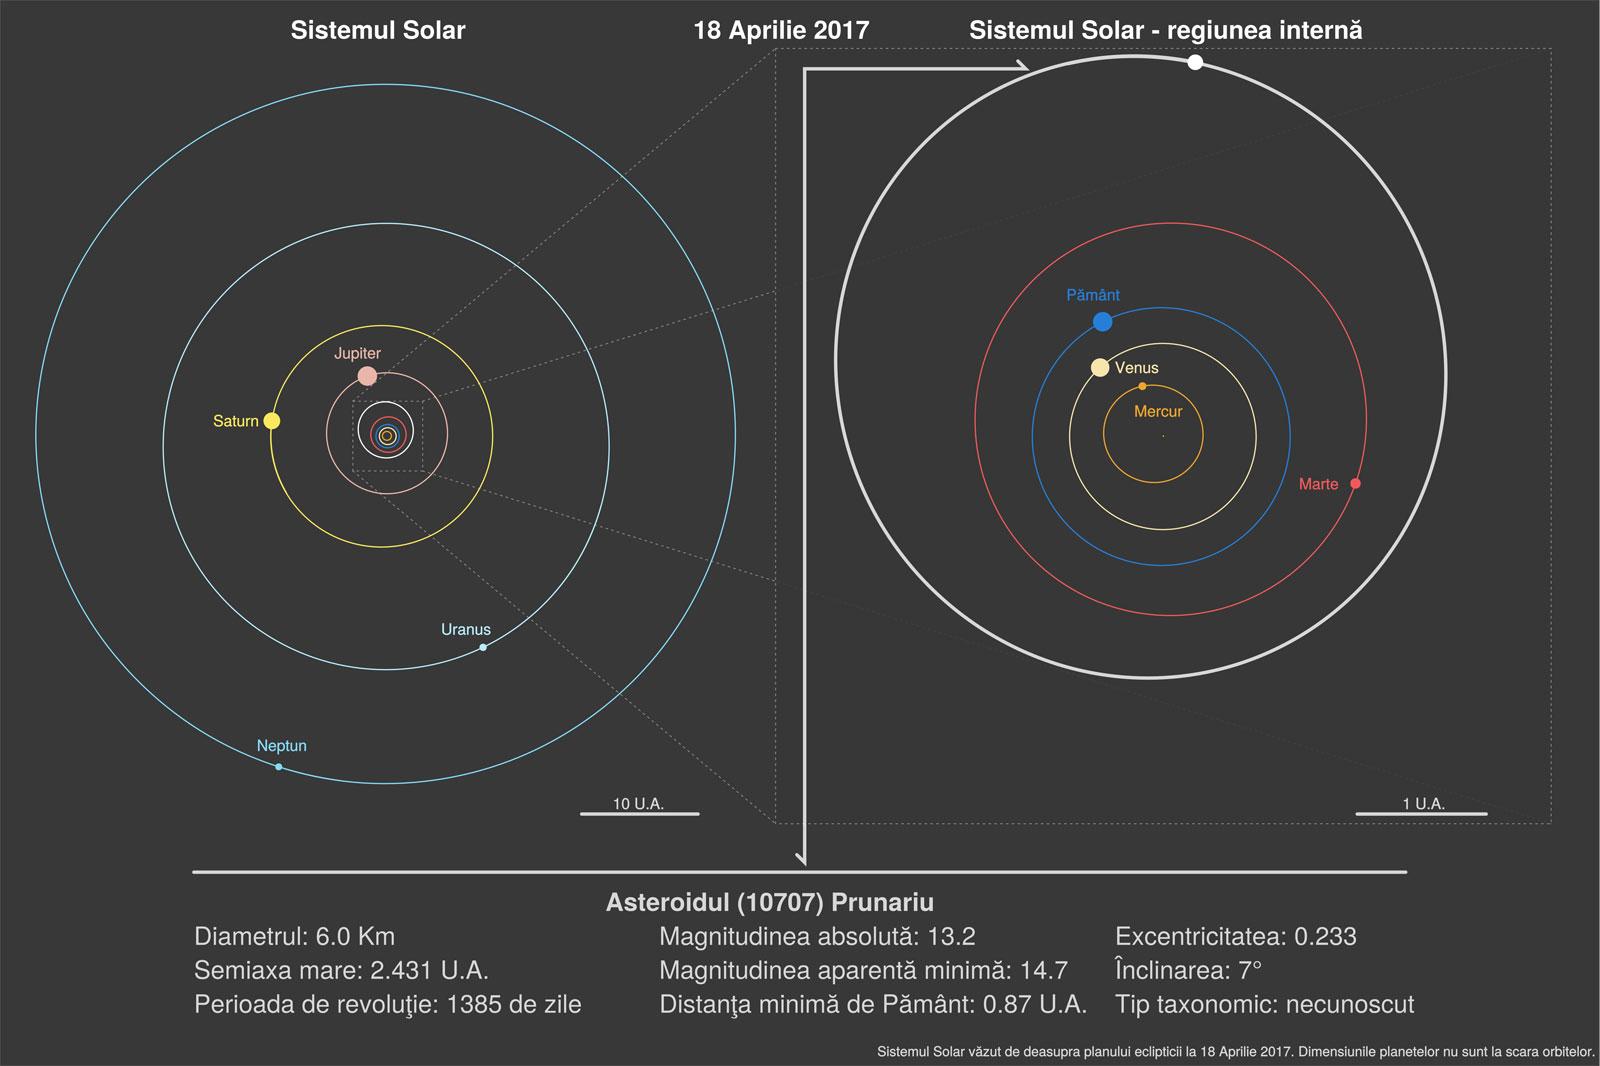 asteroid-prunariu-ioan-marius-stiinta-tehnica-1